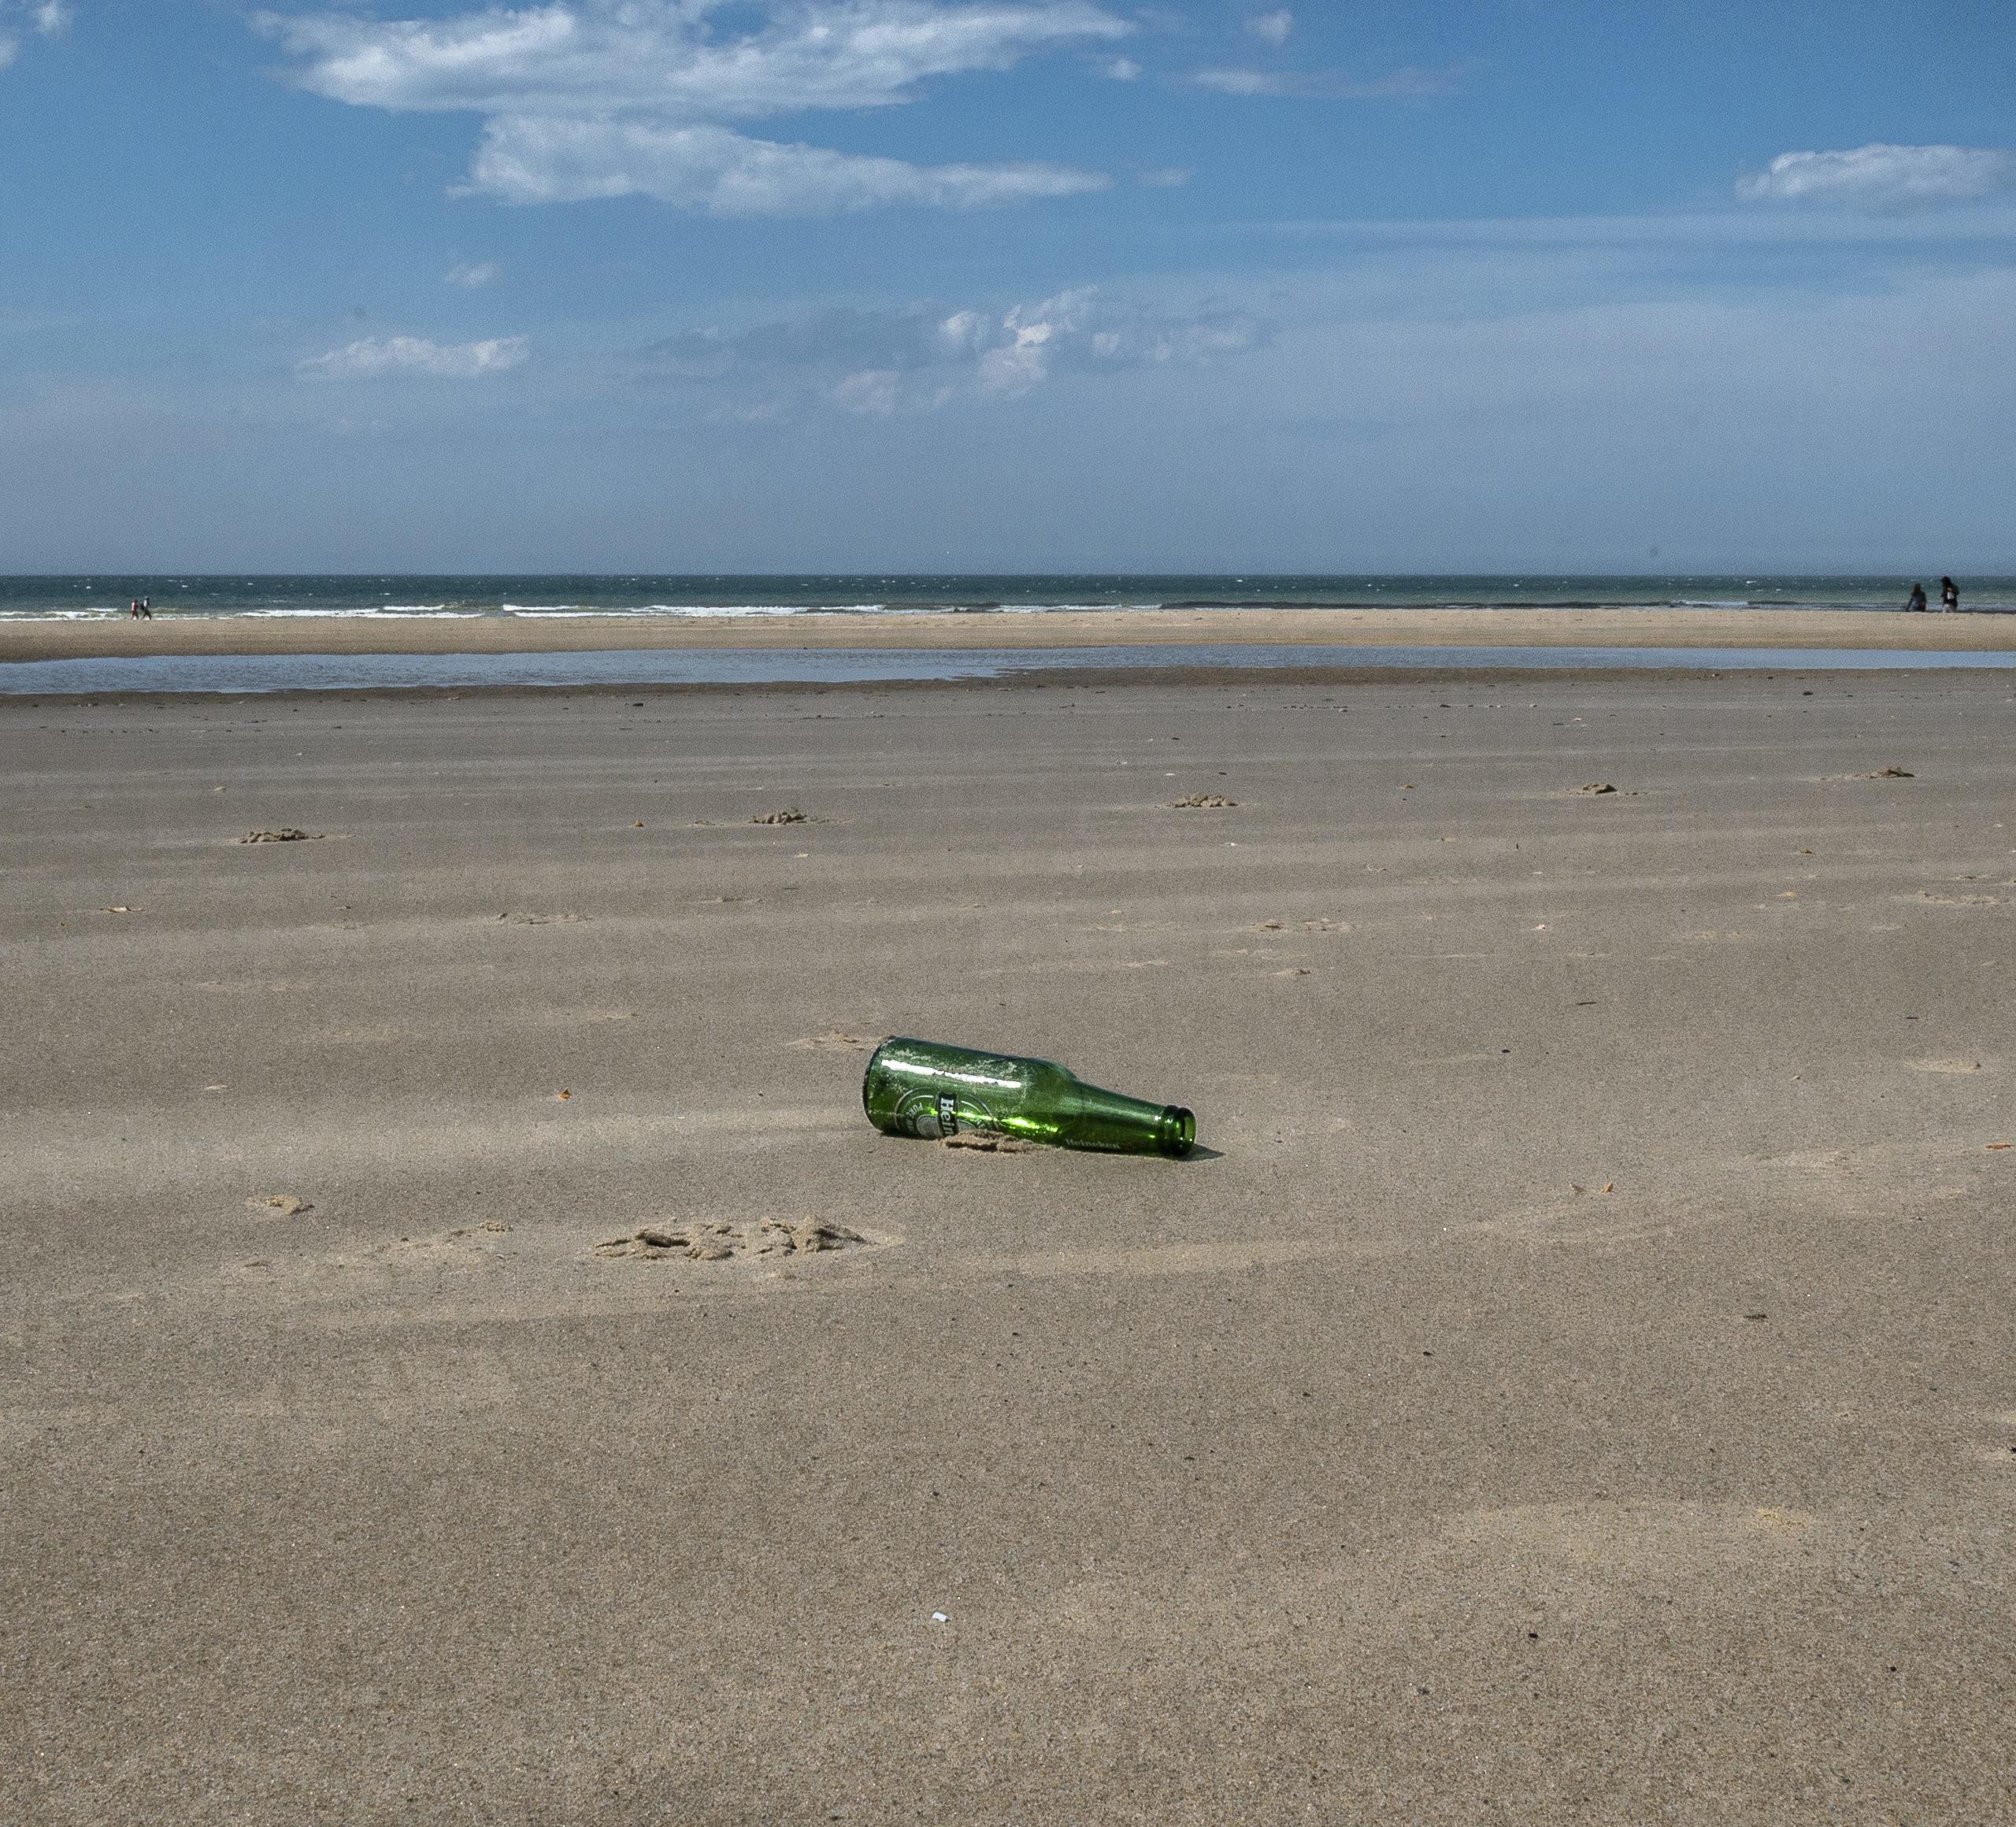 Anormale sortie à la plage 1030604 scaled